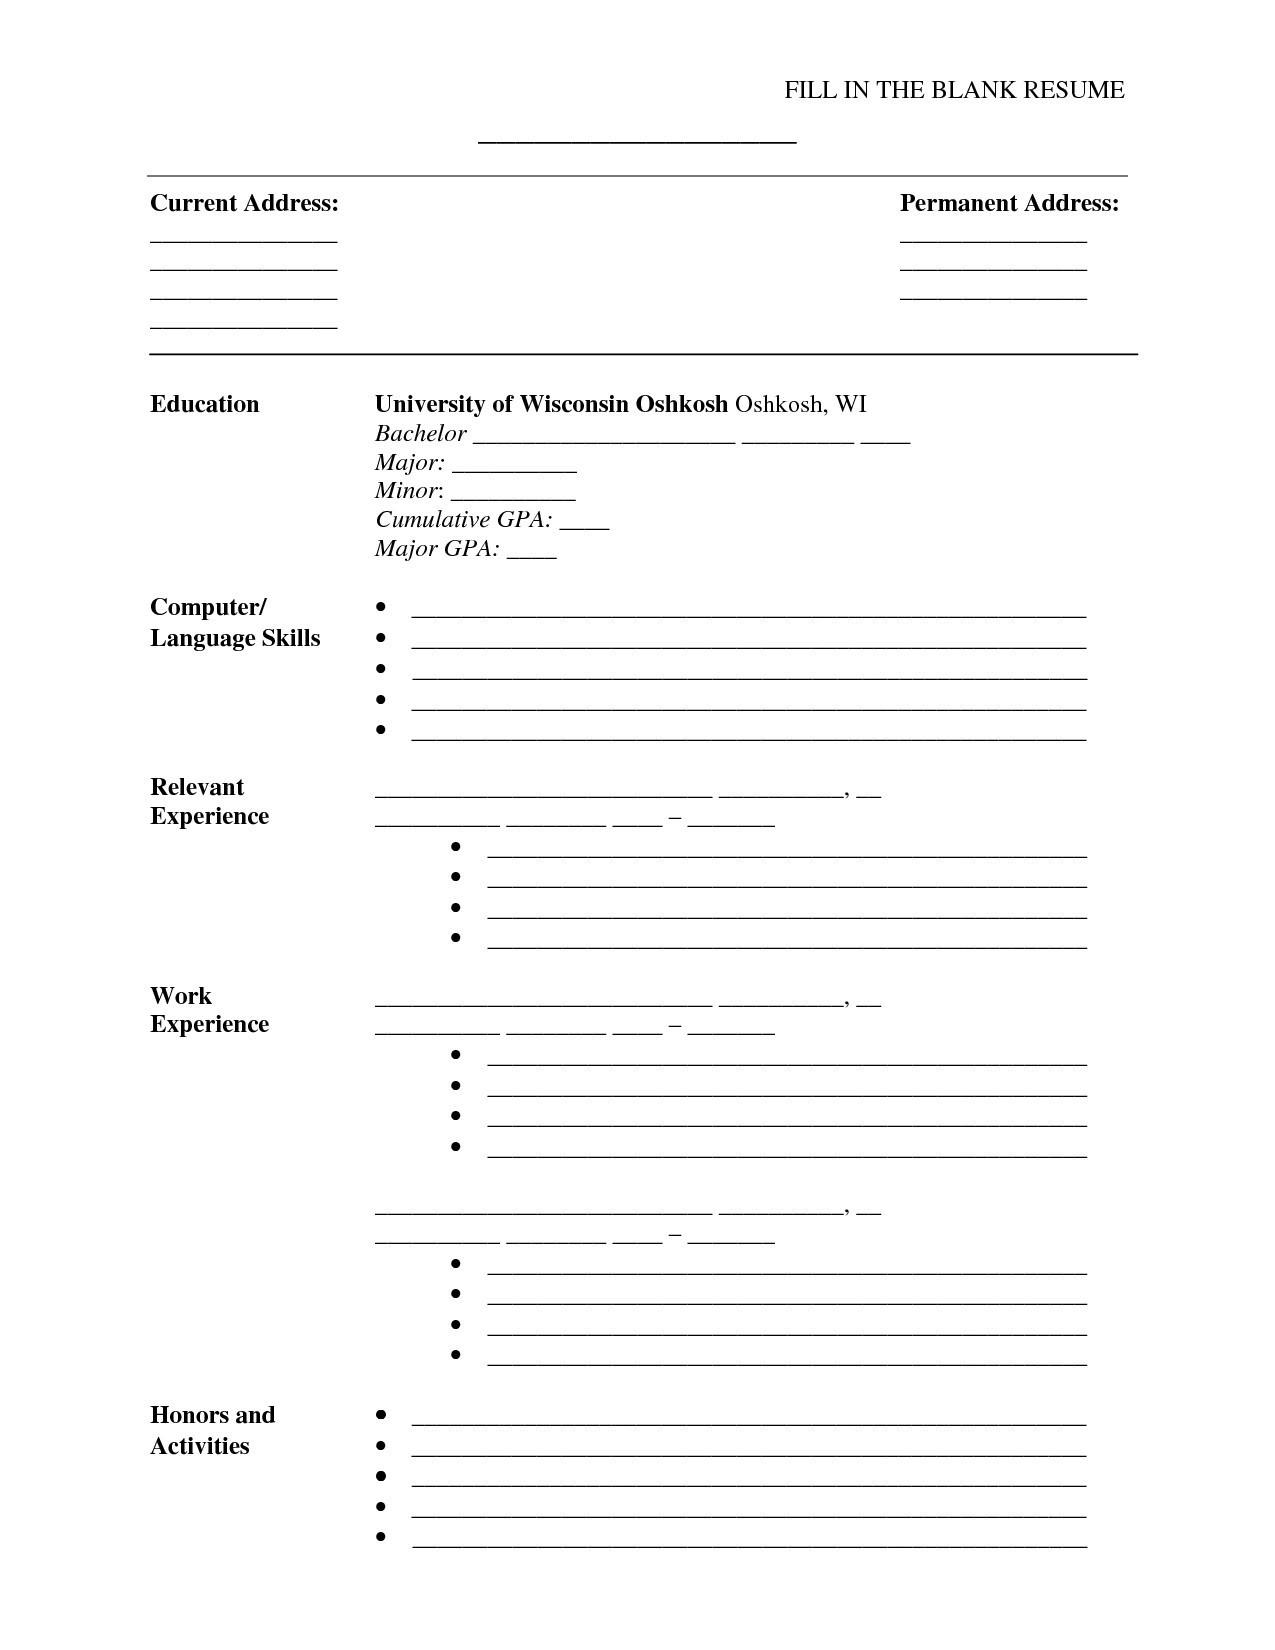 Resume Templates Blank Free Printable New Free Printable Resume - Free Printable Fill In The Blank Resume Templates